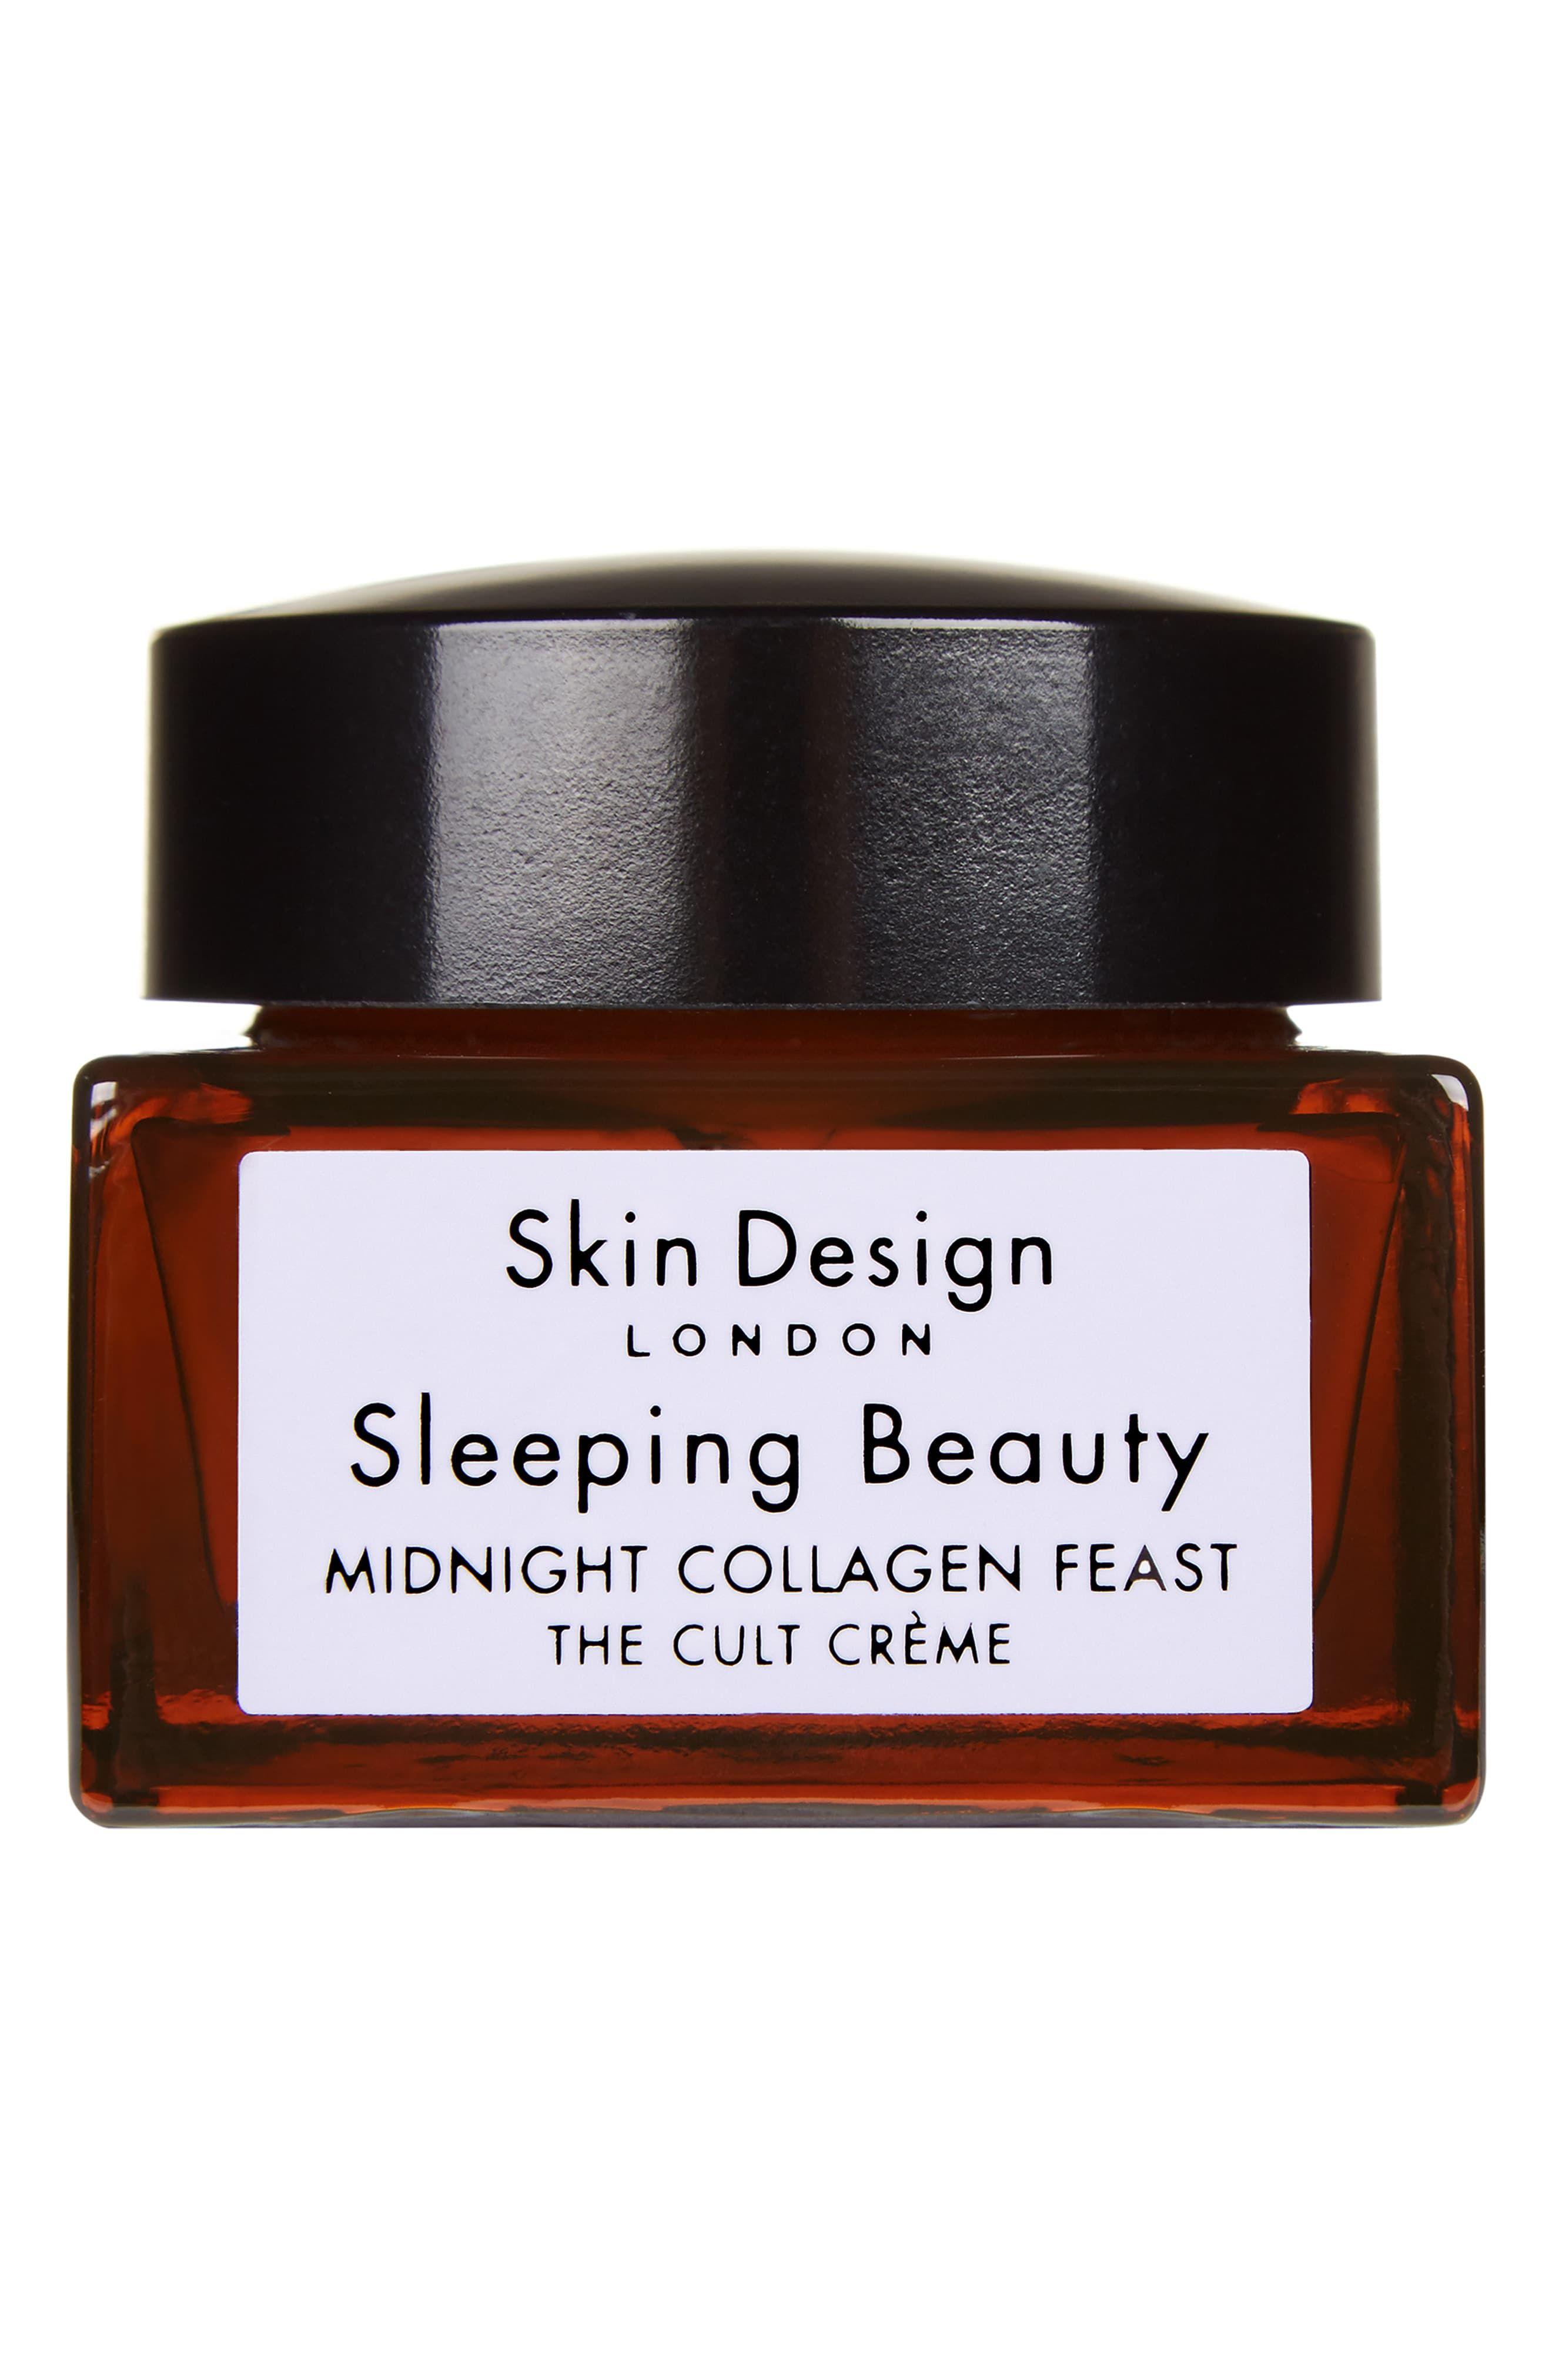 Skin Design London Sleeping Beauty Crème, Size 1.7 oz